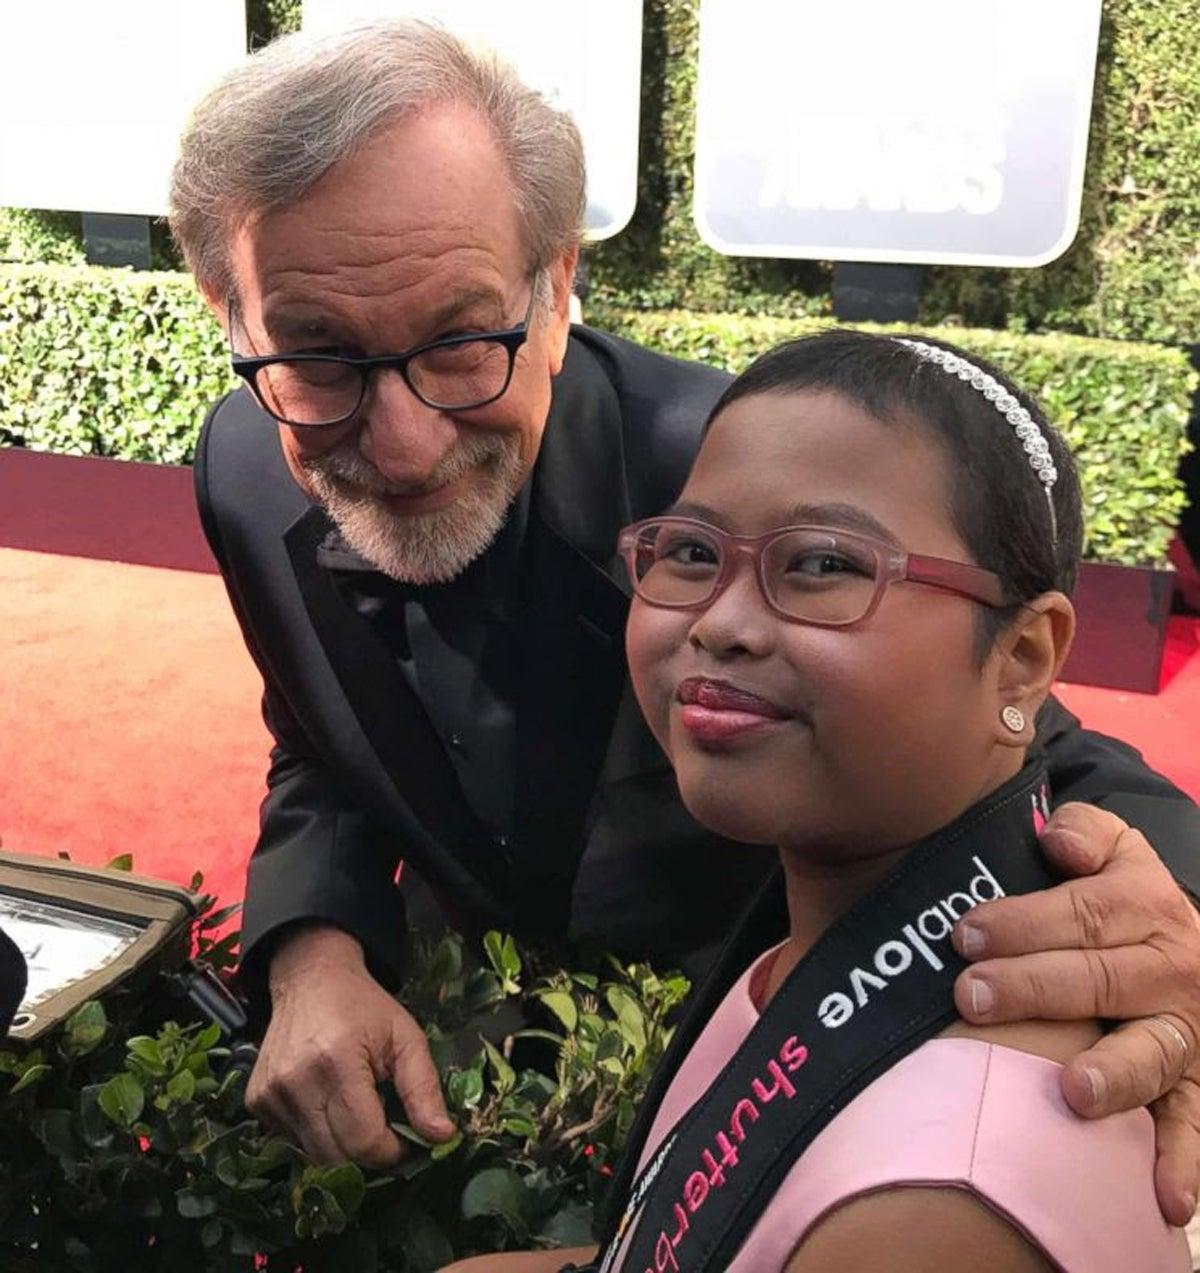 Steven Spielberg and Francine Gascon, our 2018 Golden Globes Pablove Shutterbug